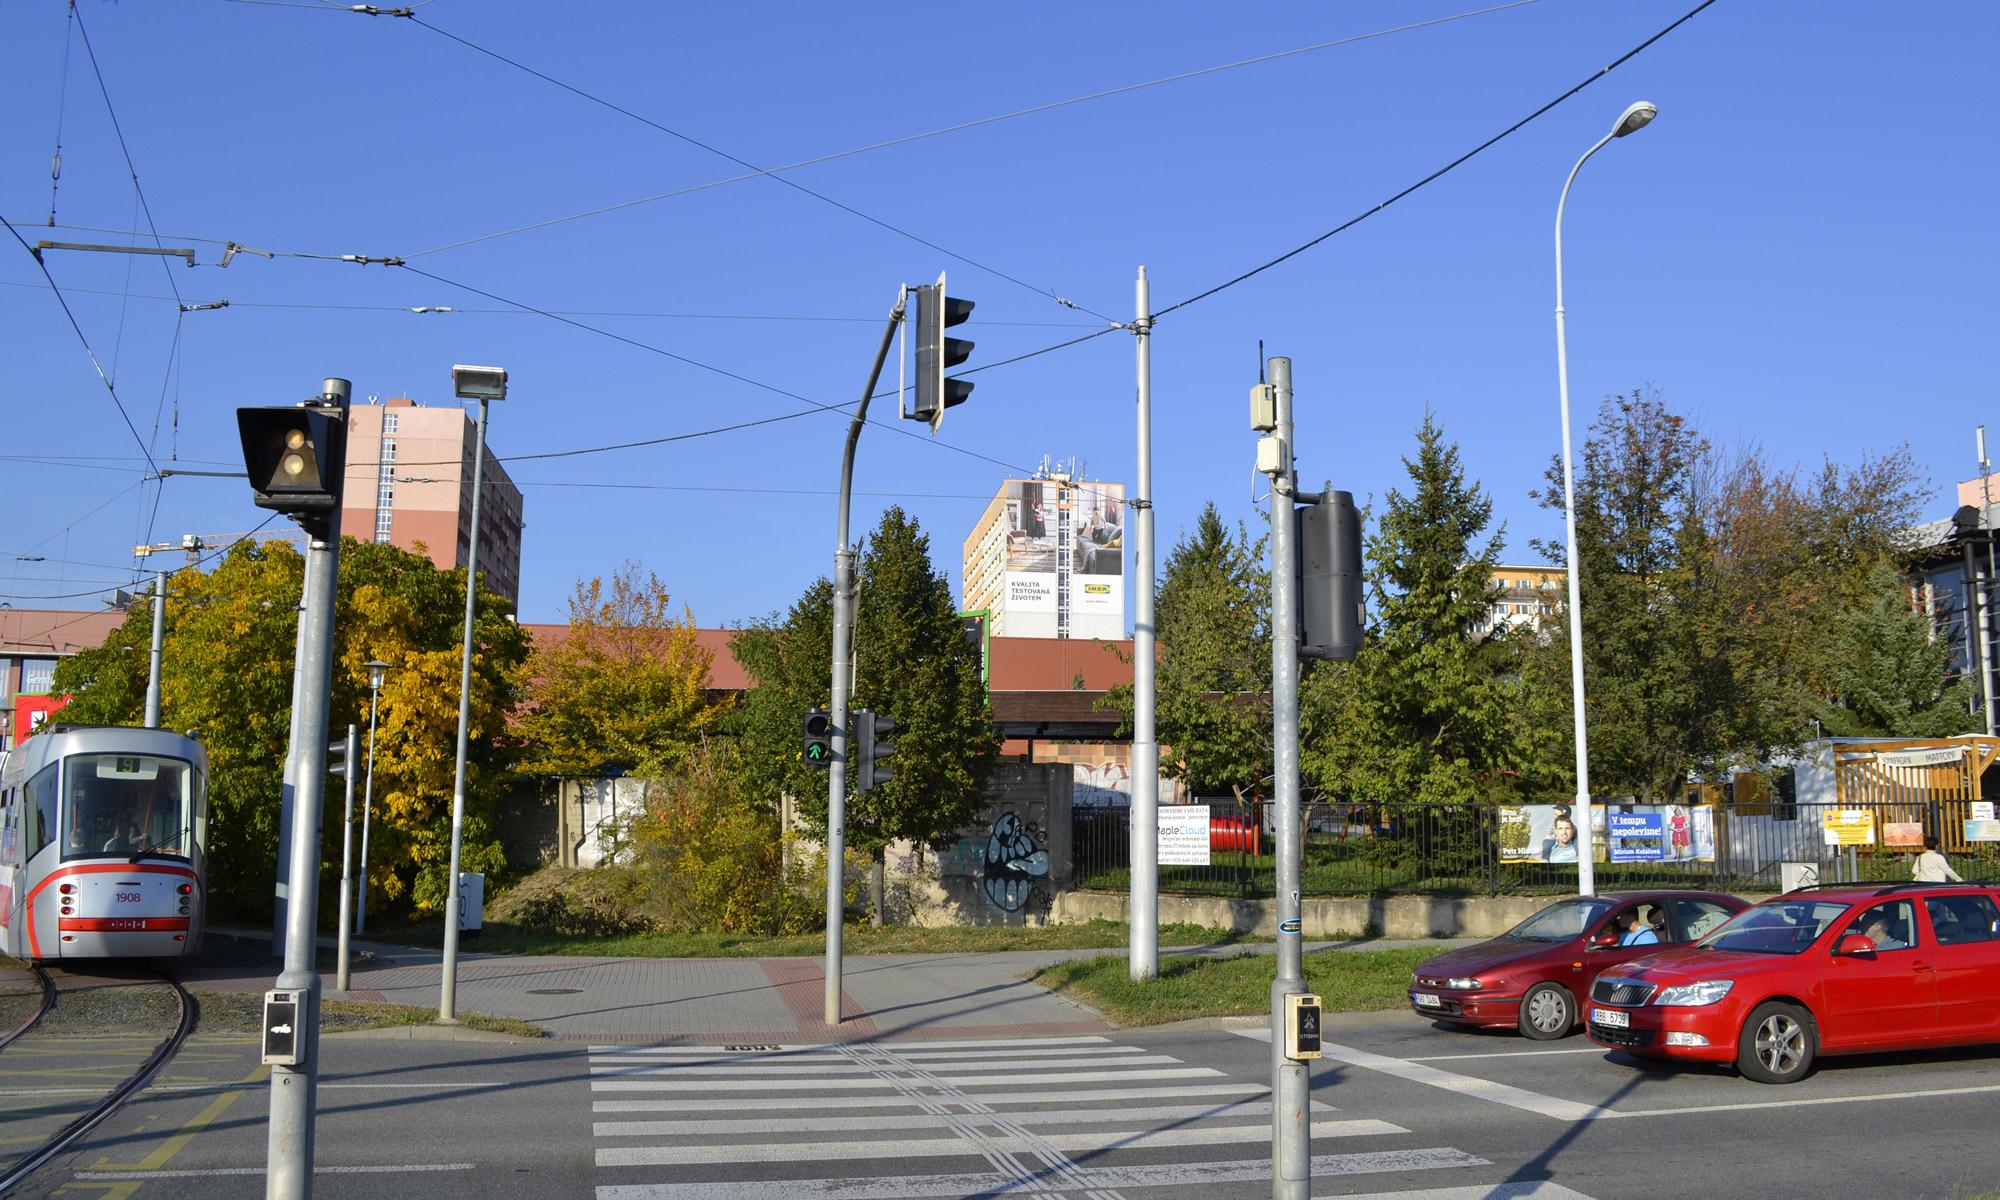 WEREK-MEDIA-Reklamni-plochy-Brno---038ZB-Halasovo-namesti---klient-IKEA---OOH-kampan-10-2018-(4)